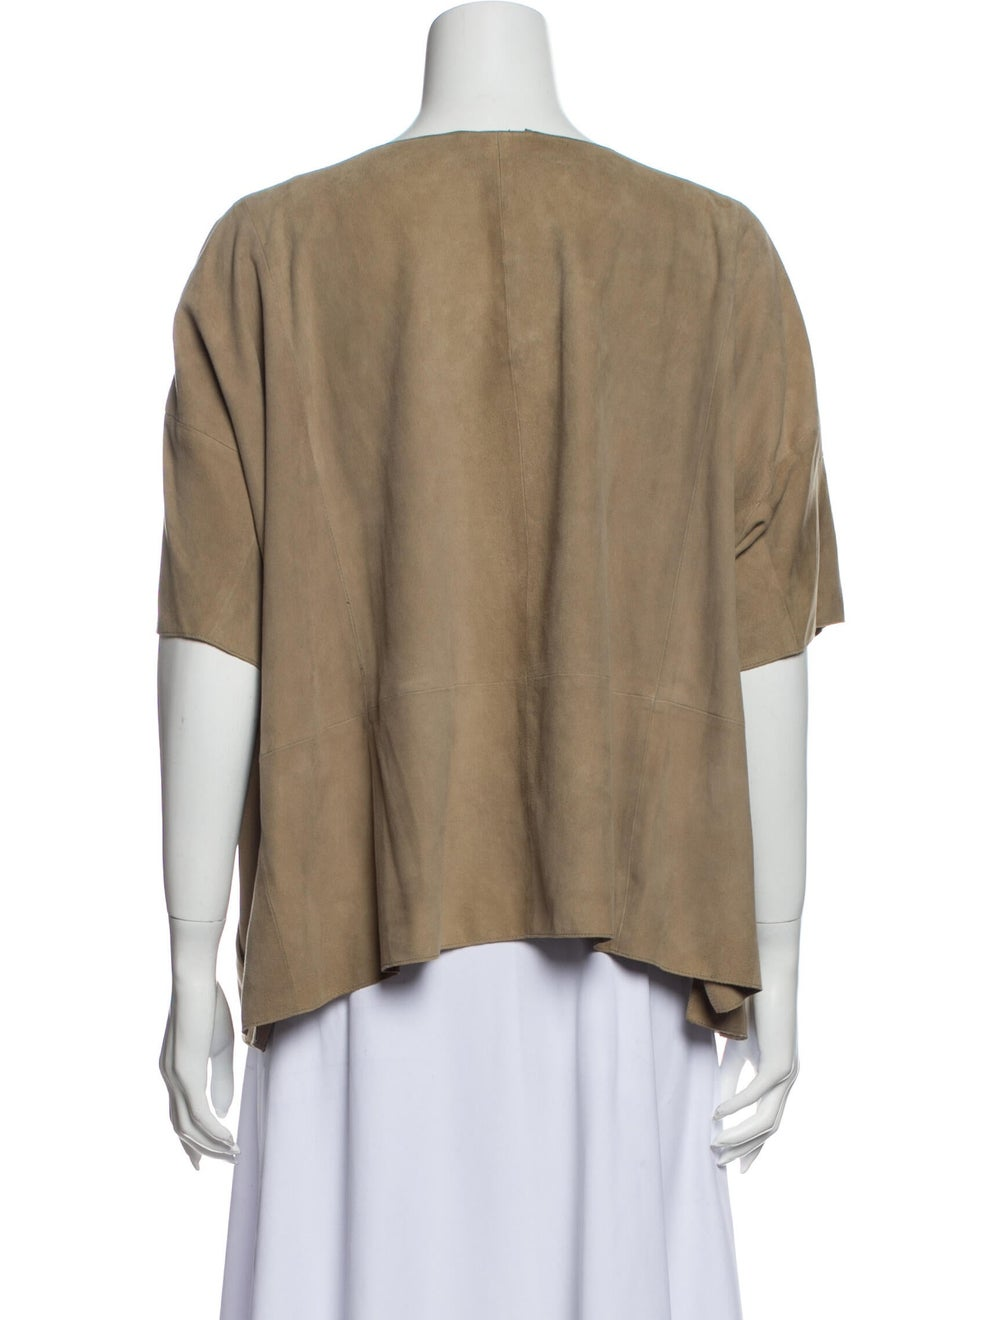 Vince Leather Scoop Neck T-Shirt - image 3